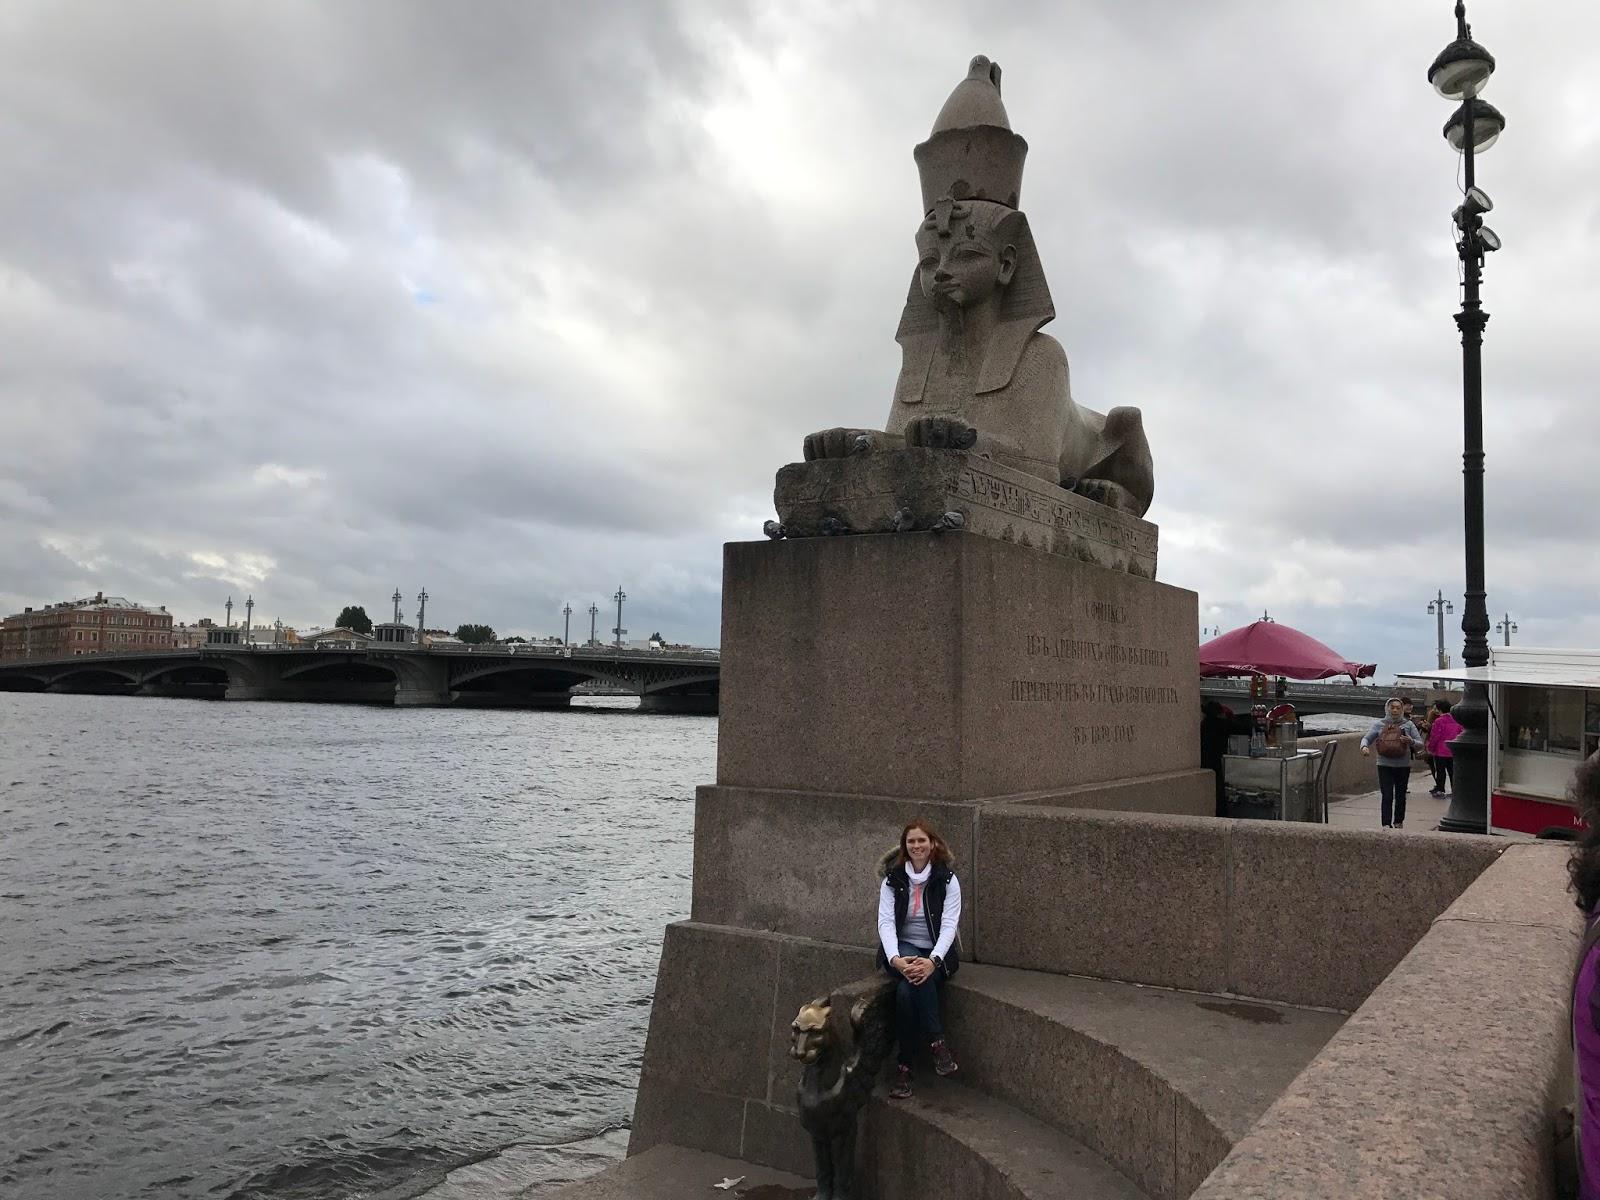 Esfinges - São Petersburgo